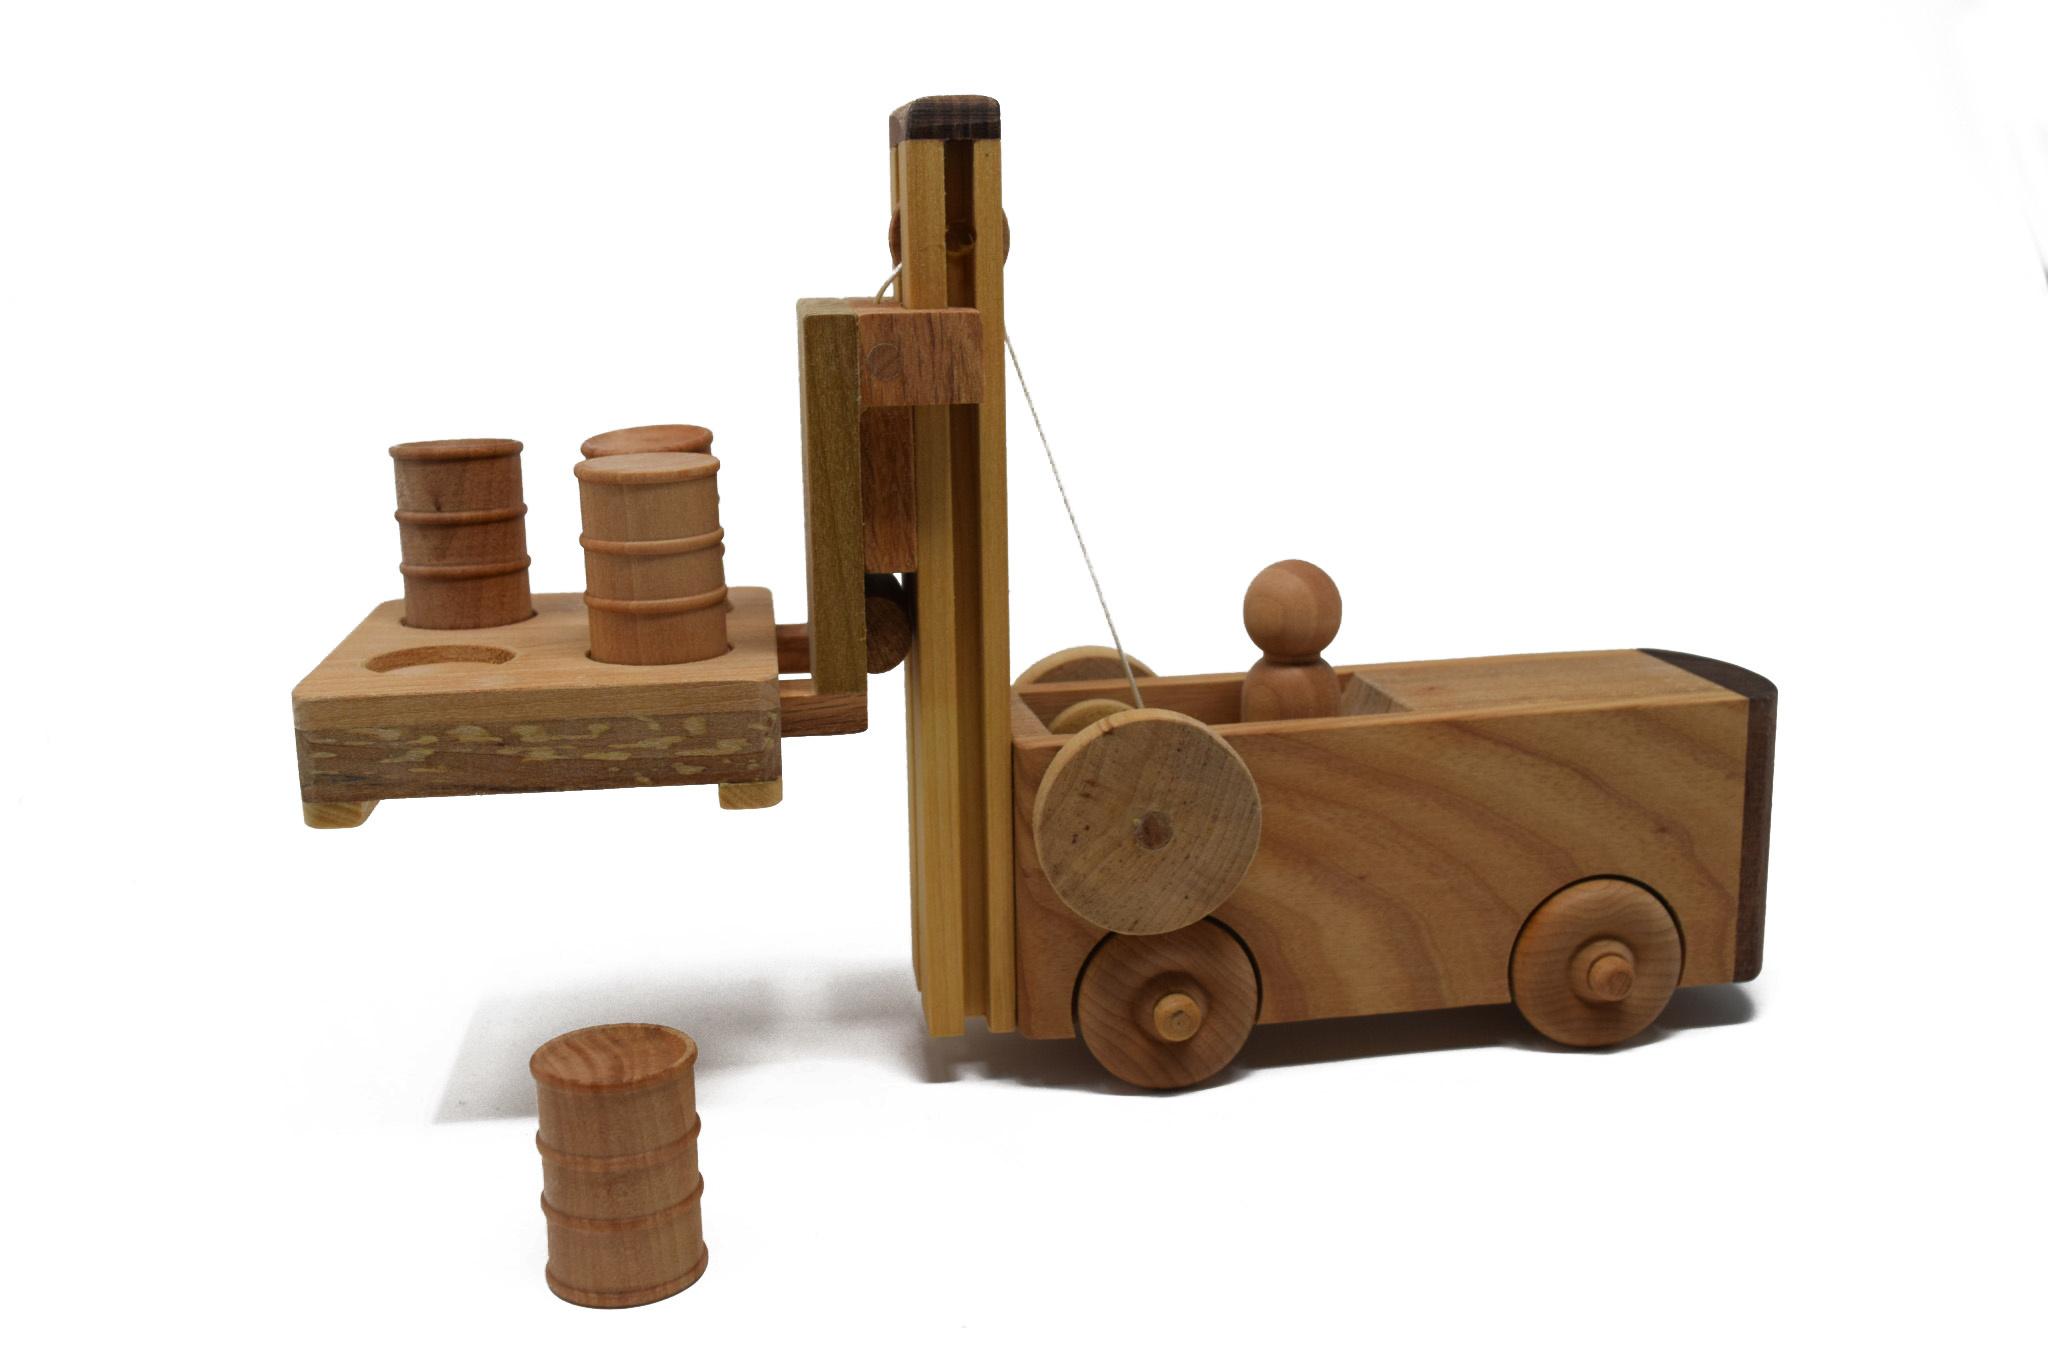 Wooden Forklift Toy-1